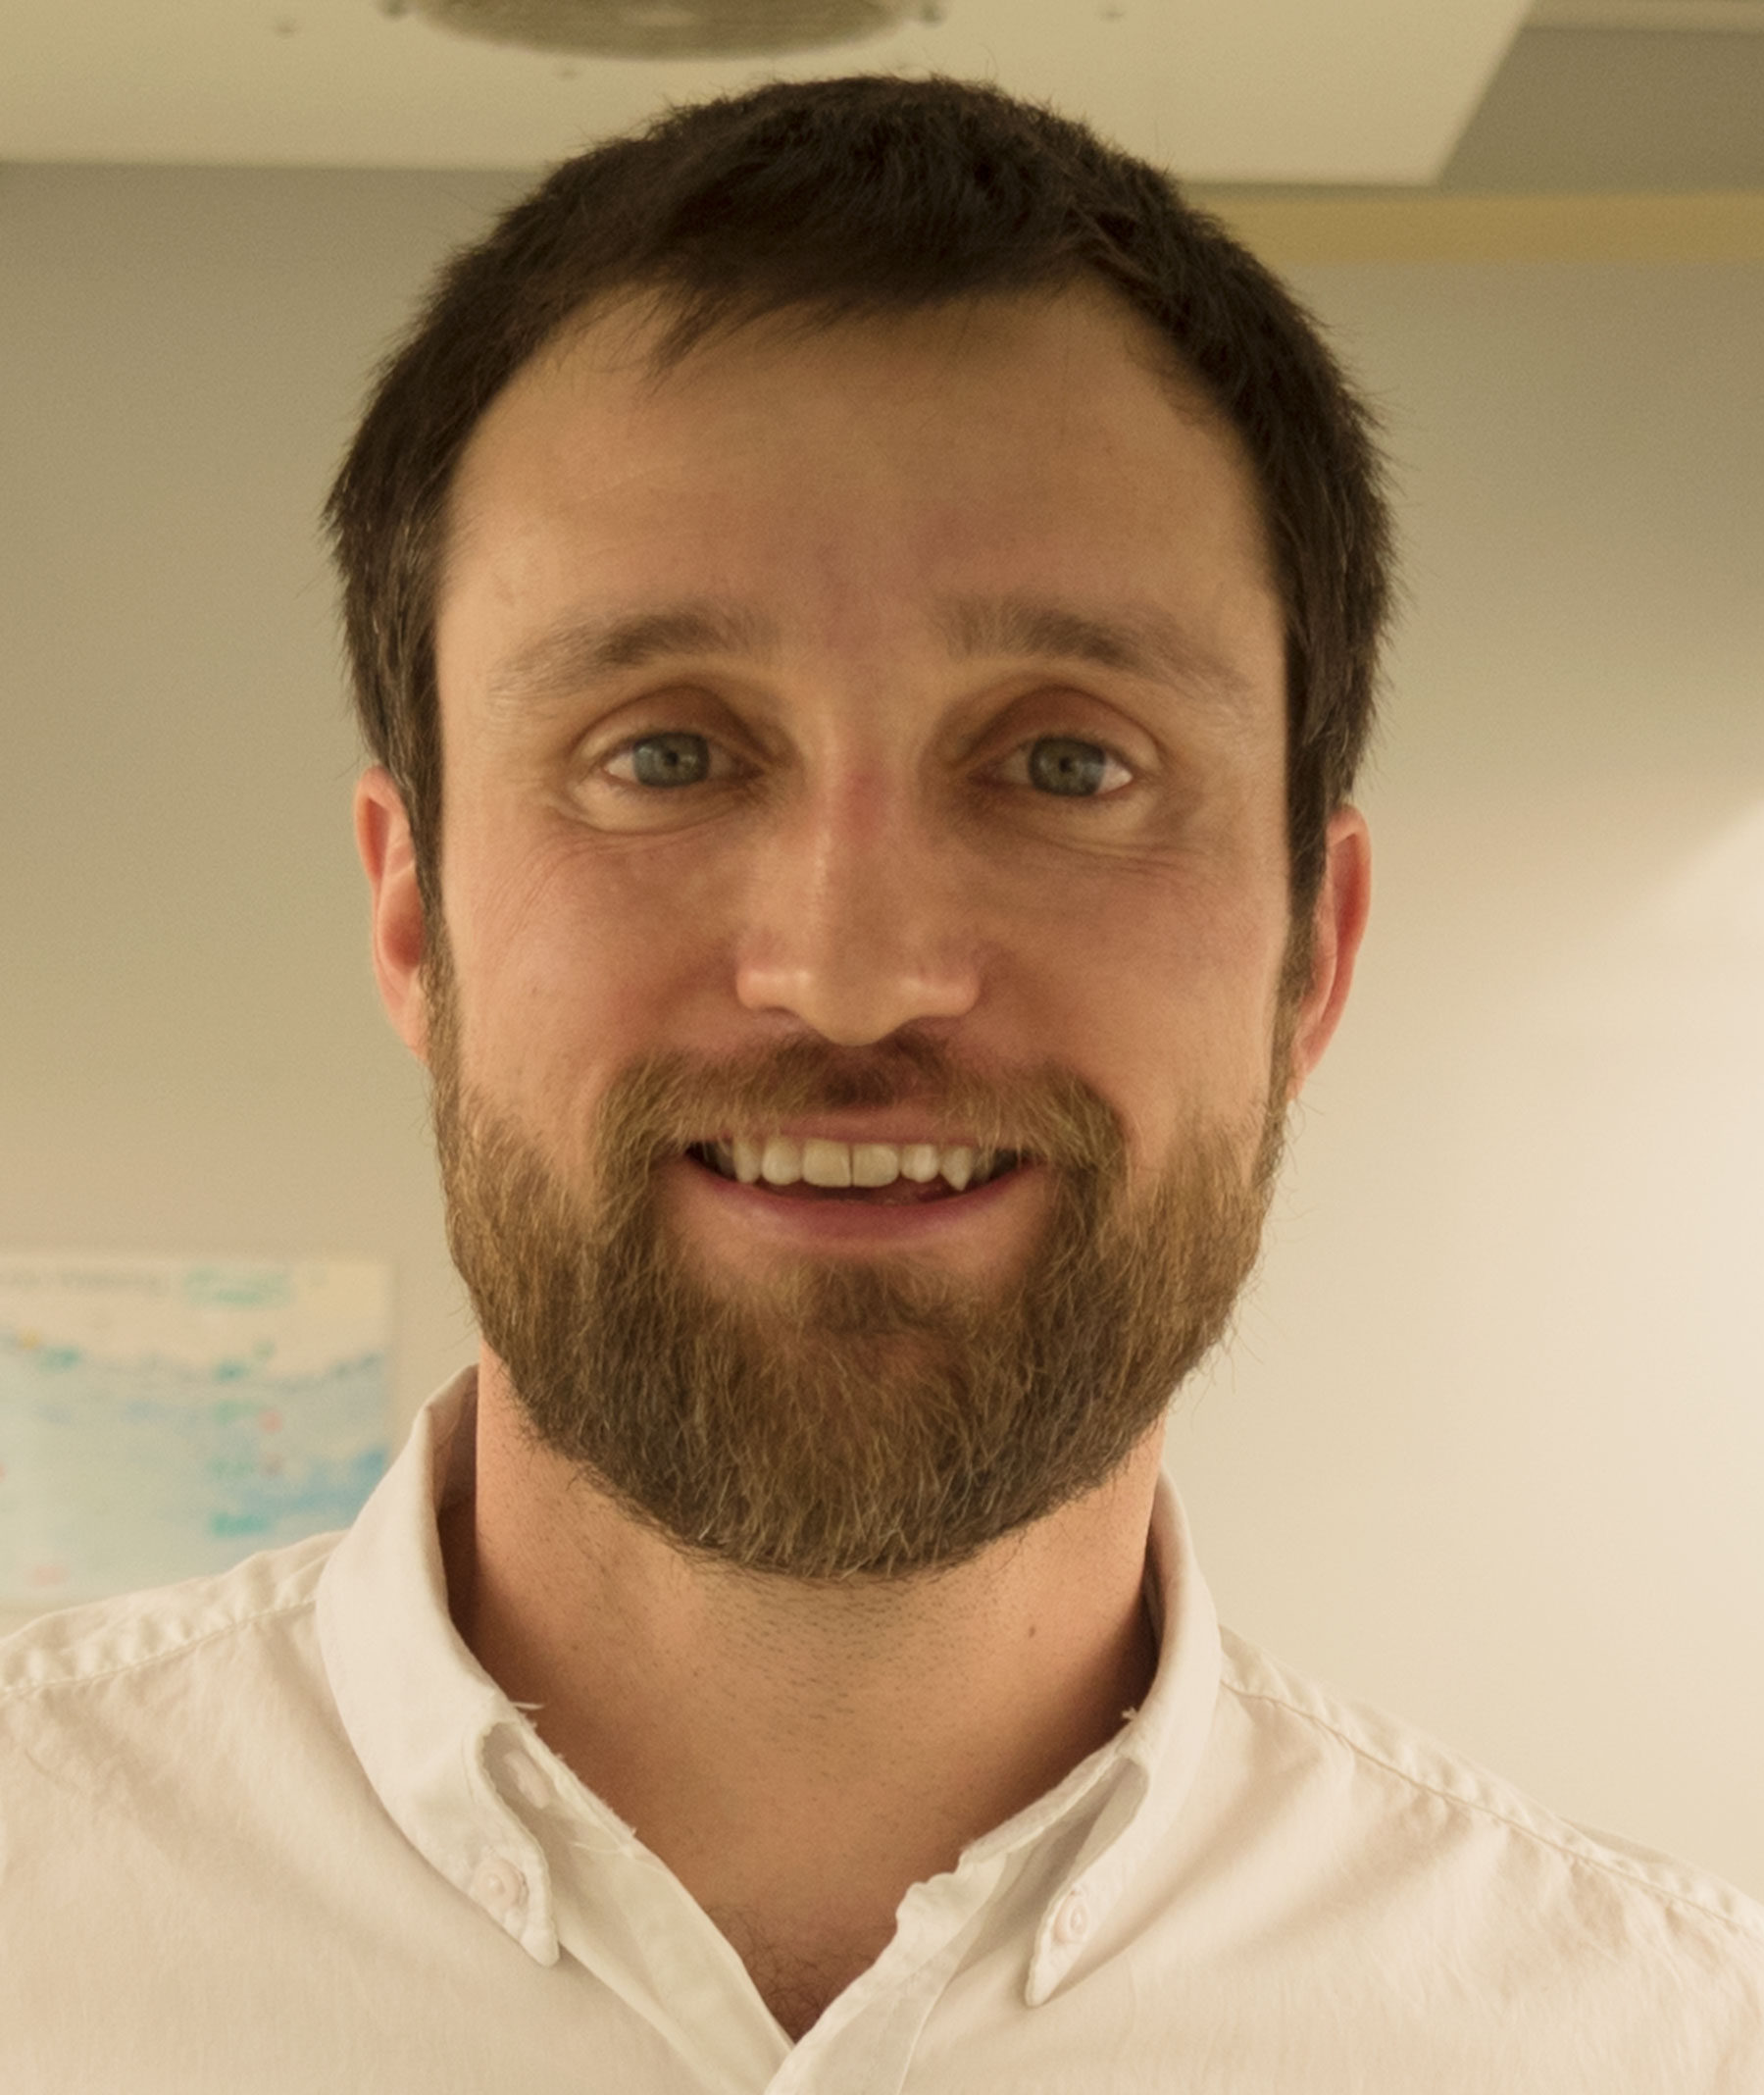 Photo of Andrew Maule, BTP Trainee